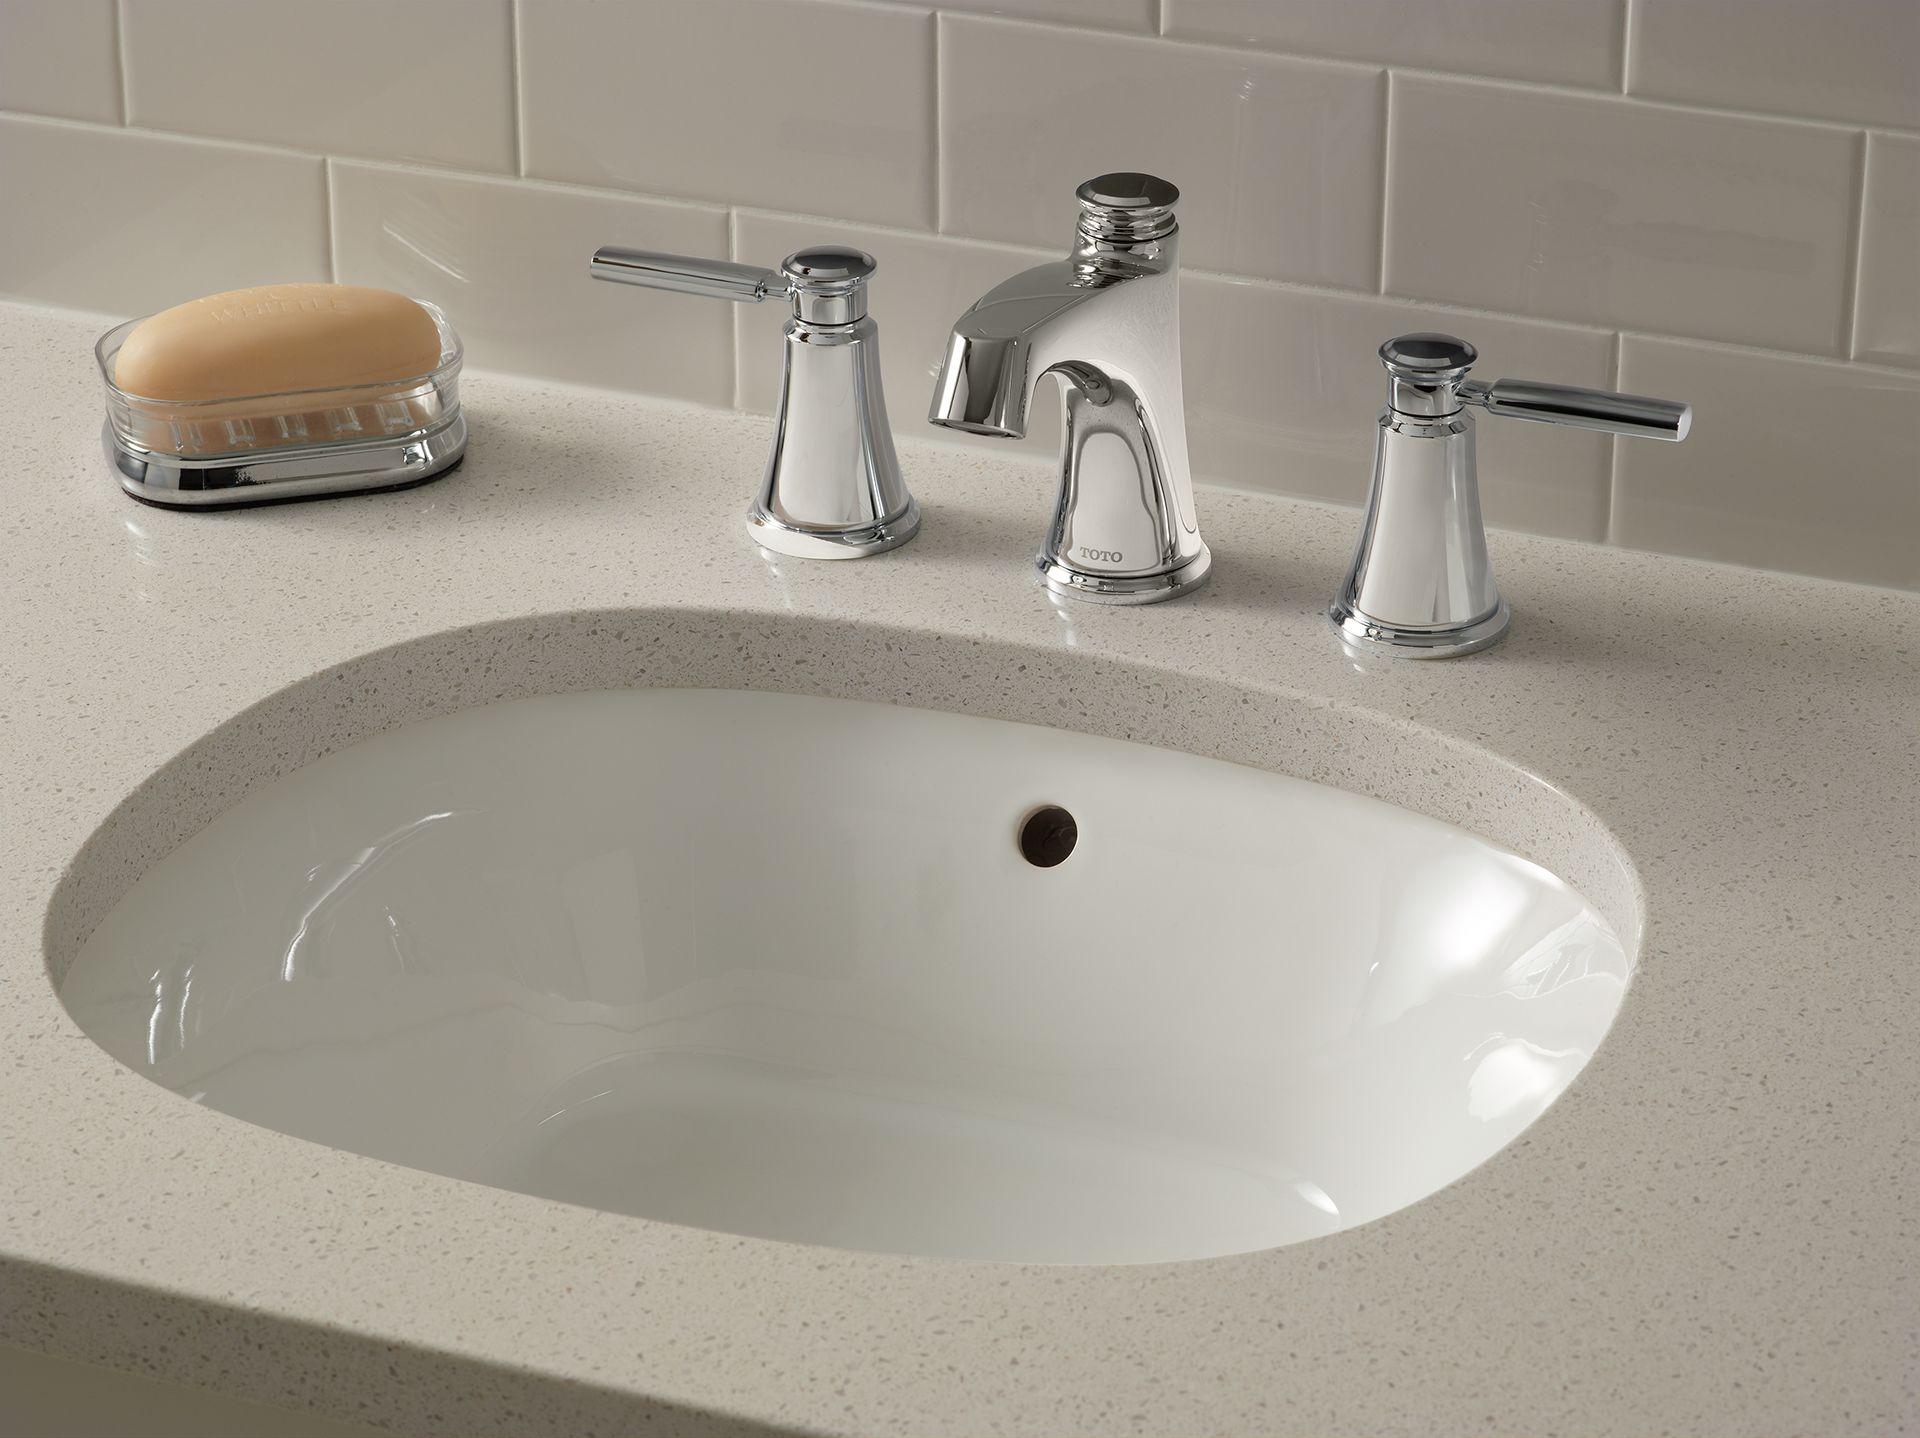 Keane™ Widespread Lavatory Faucet TotoUSA